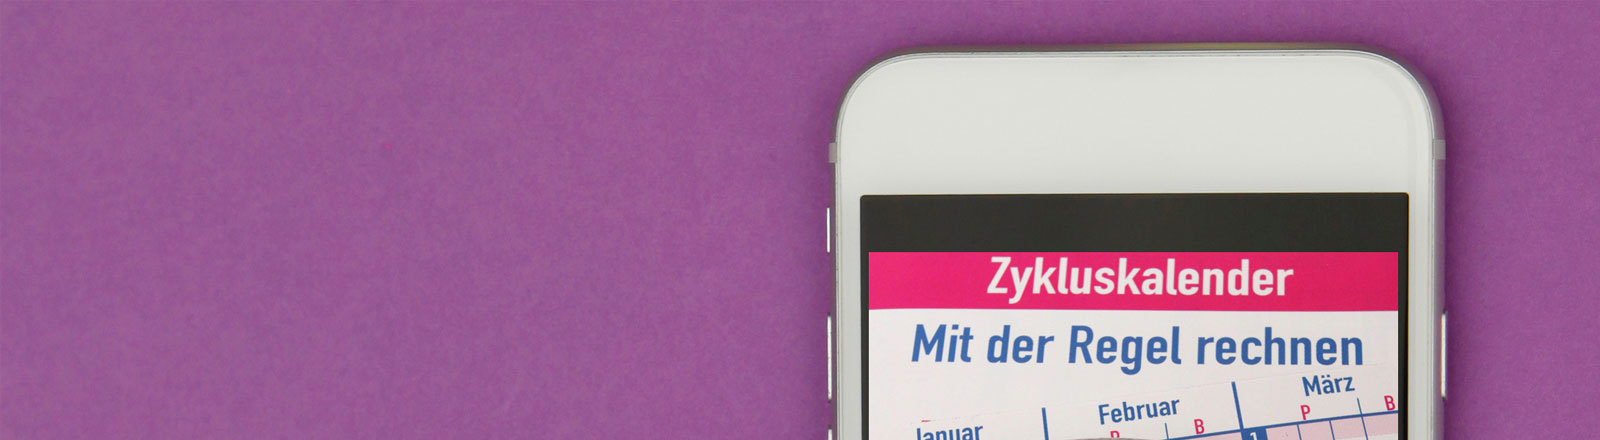 Zykluskalender Smartphone